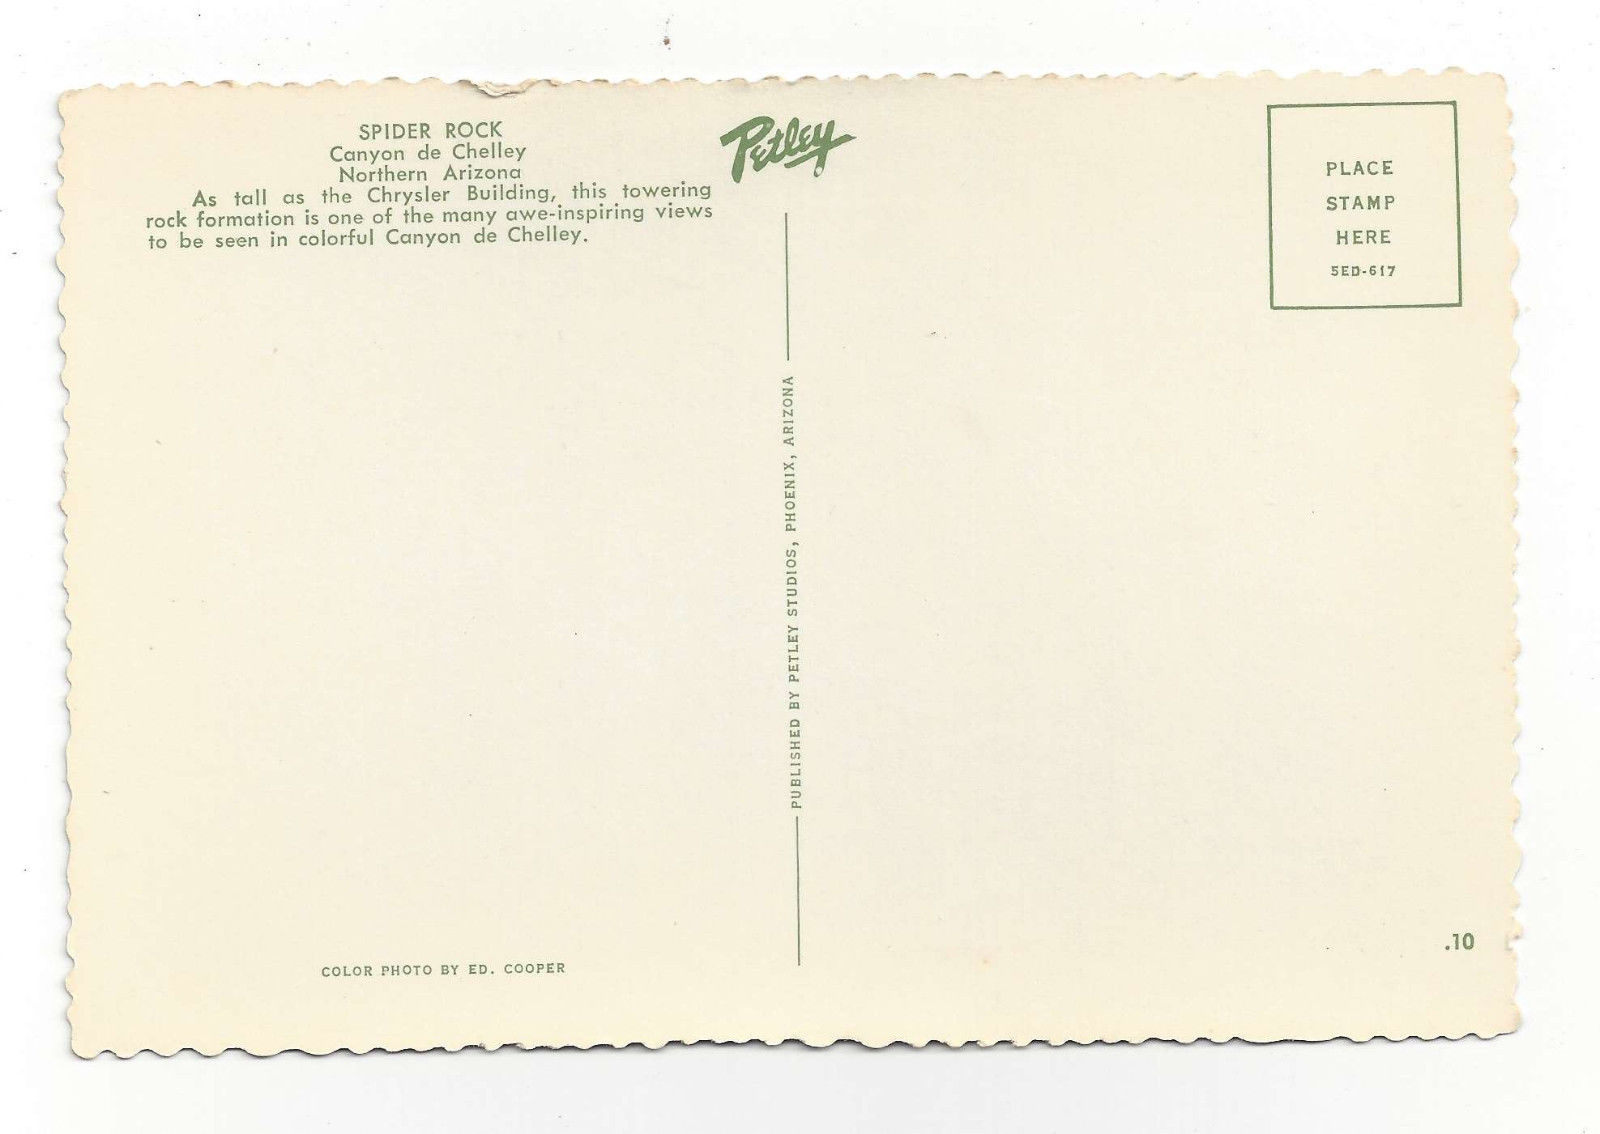 AZ Canyon de Chelley Spider Rock Vtg Postcard 4X6